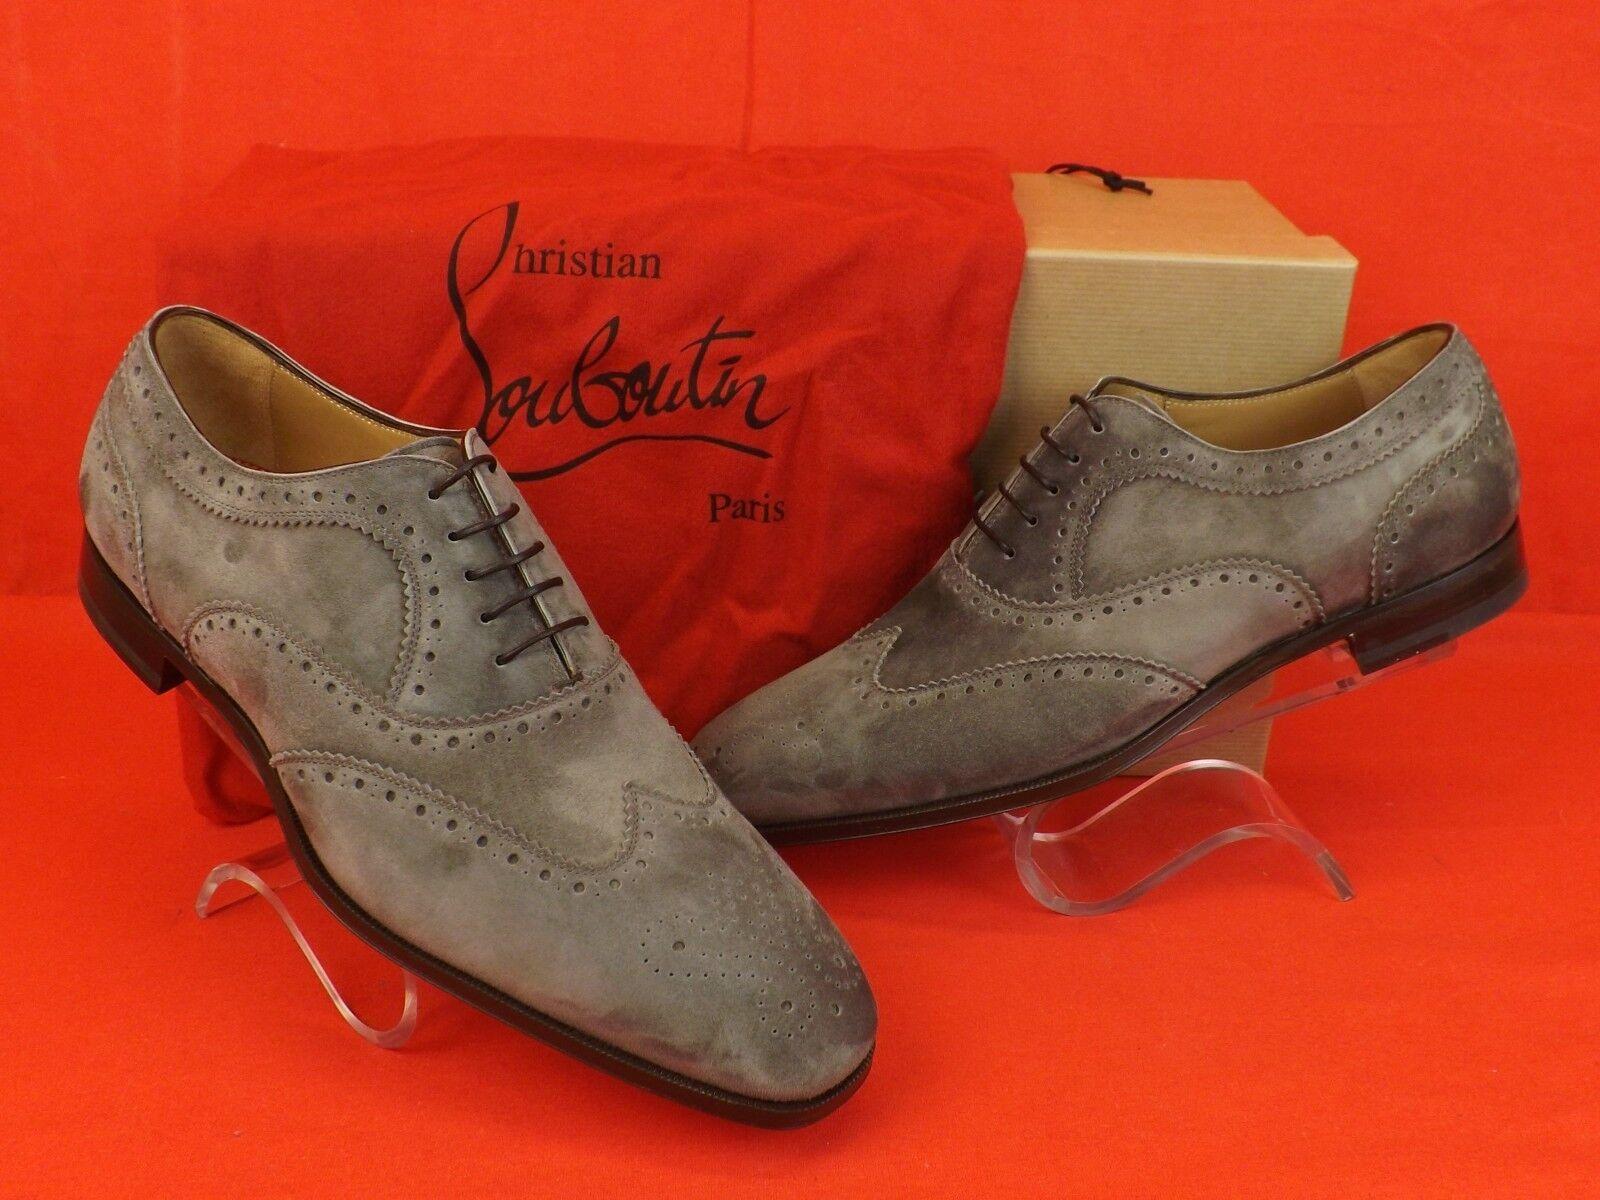 NIB LOUBOUTIN PLATTERISSIMO grigio SUEDE WINGTIP LACE UP OXFORDS BROGUE scarpe 42 9